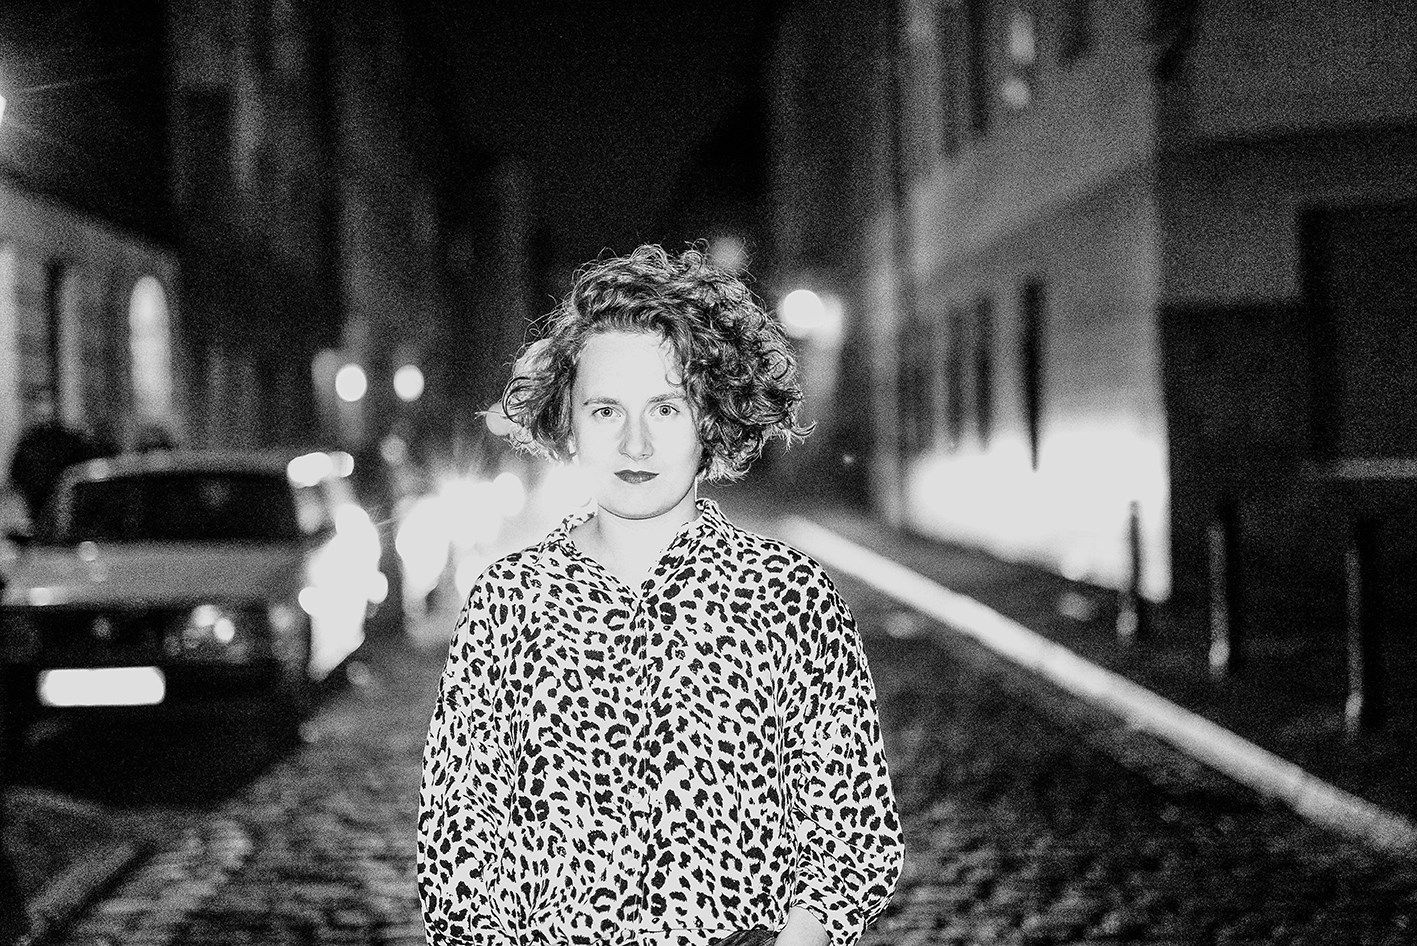 Laura Naumann/ Lesereihe, November 2018